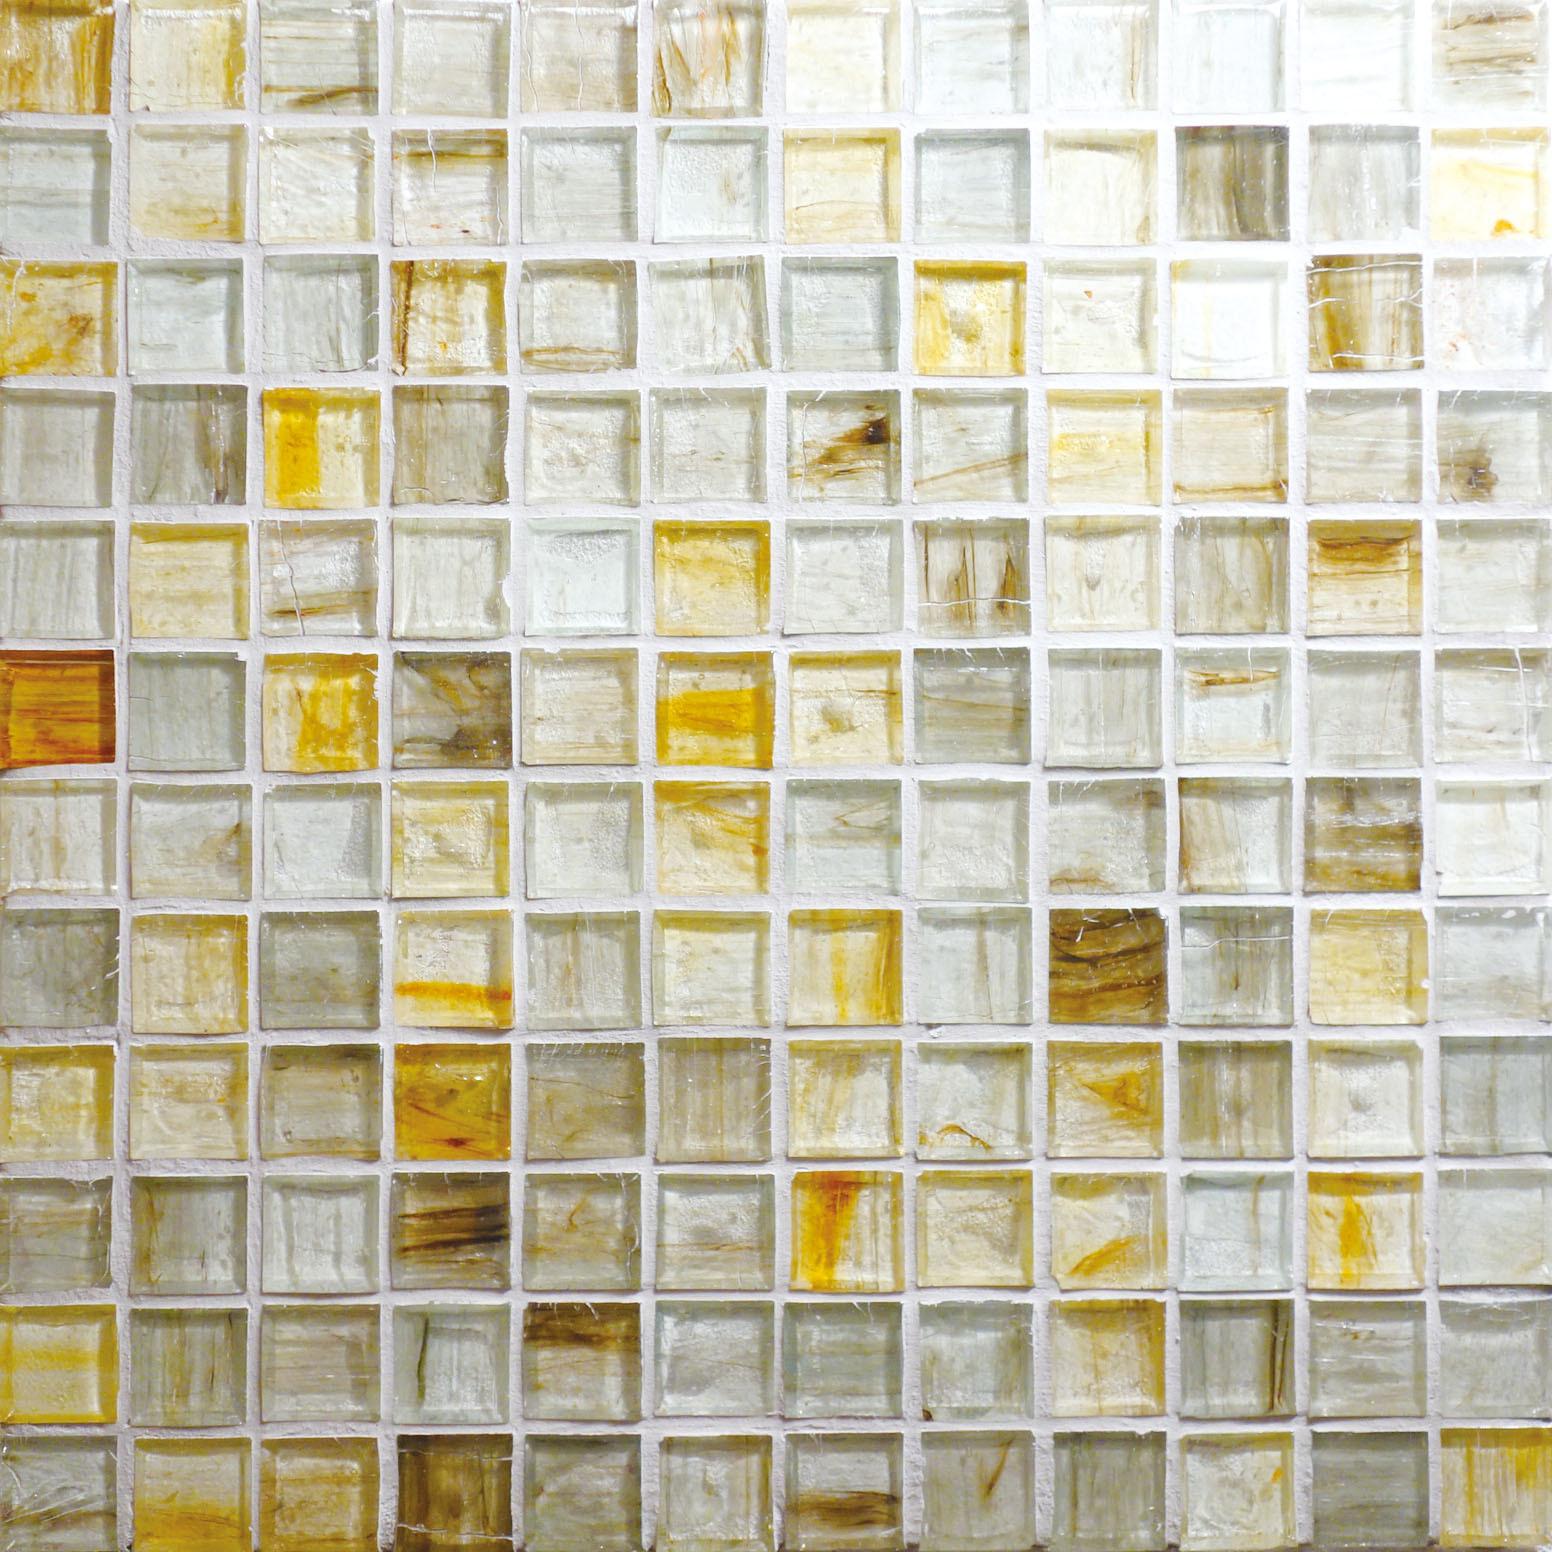 Unber Color Grass / Indium (アンバ-カラ-グラス/インジウム)